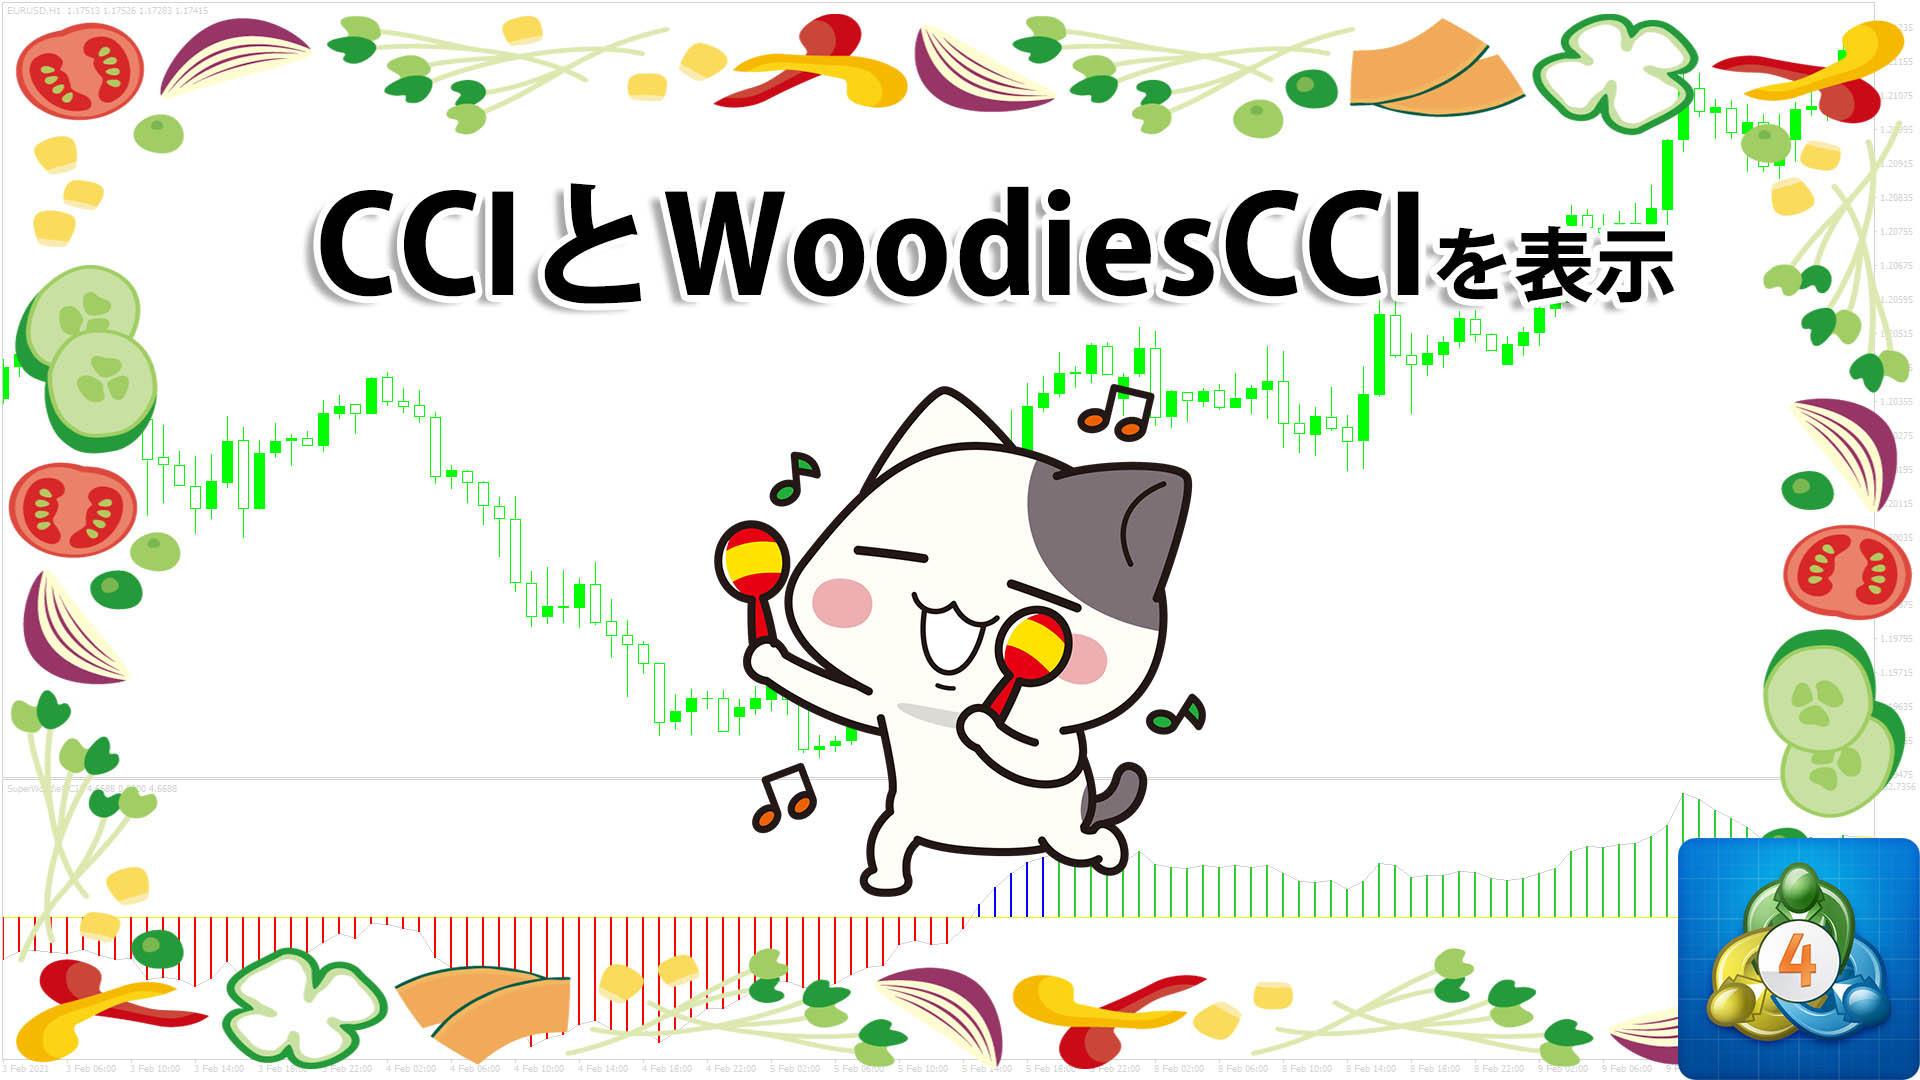 CCIとWoodiesCCIの両方を表示できるMT4インジケーター「SuperWoodieCCI2」